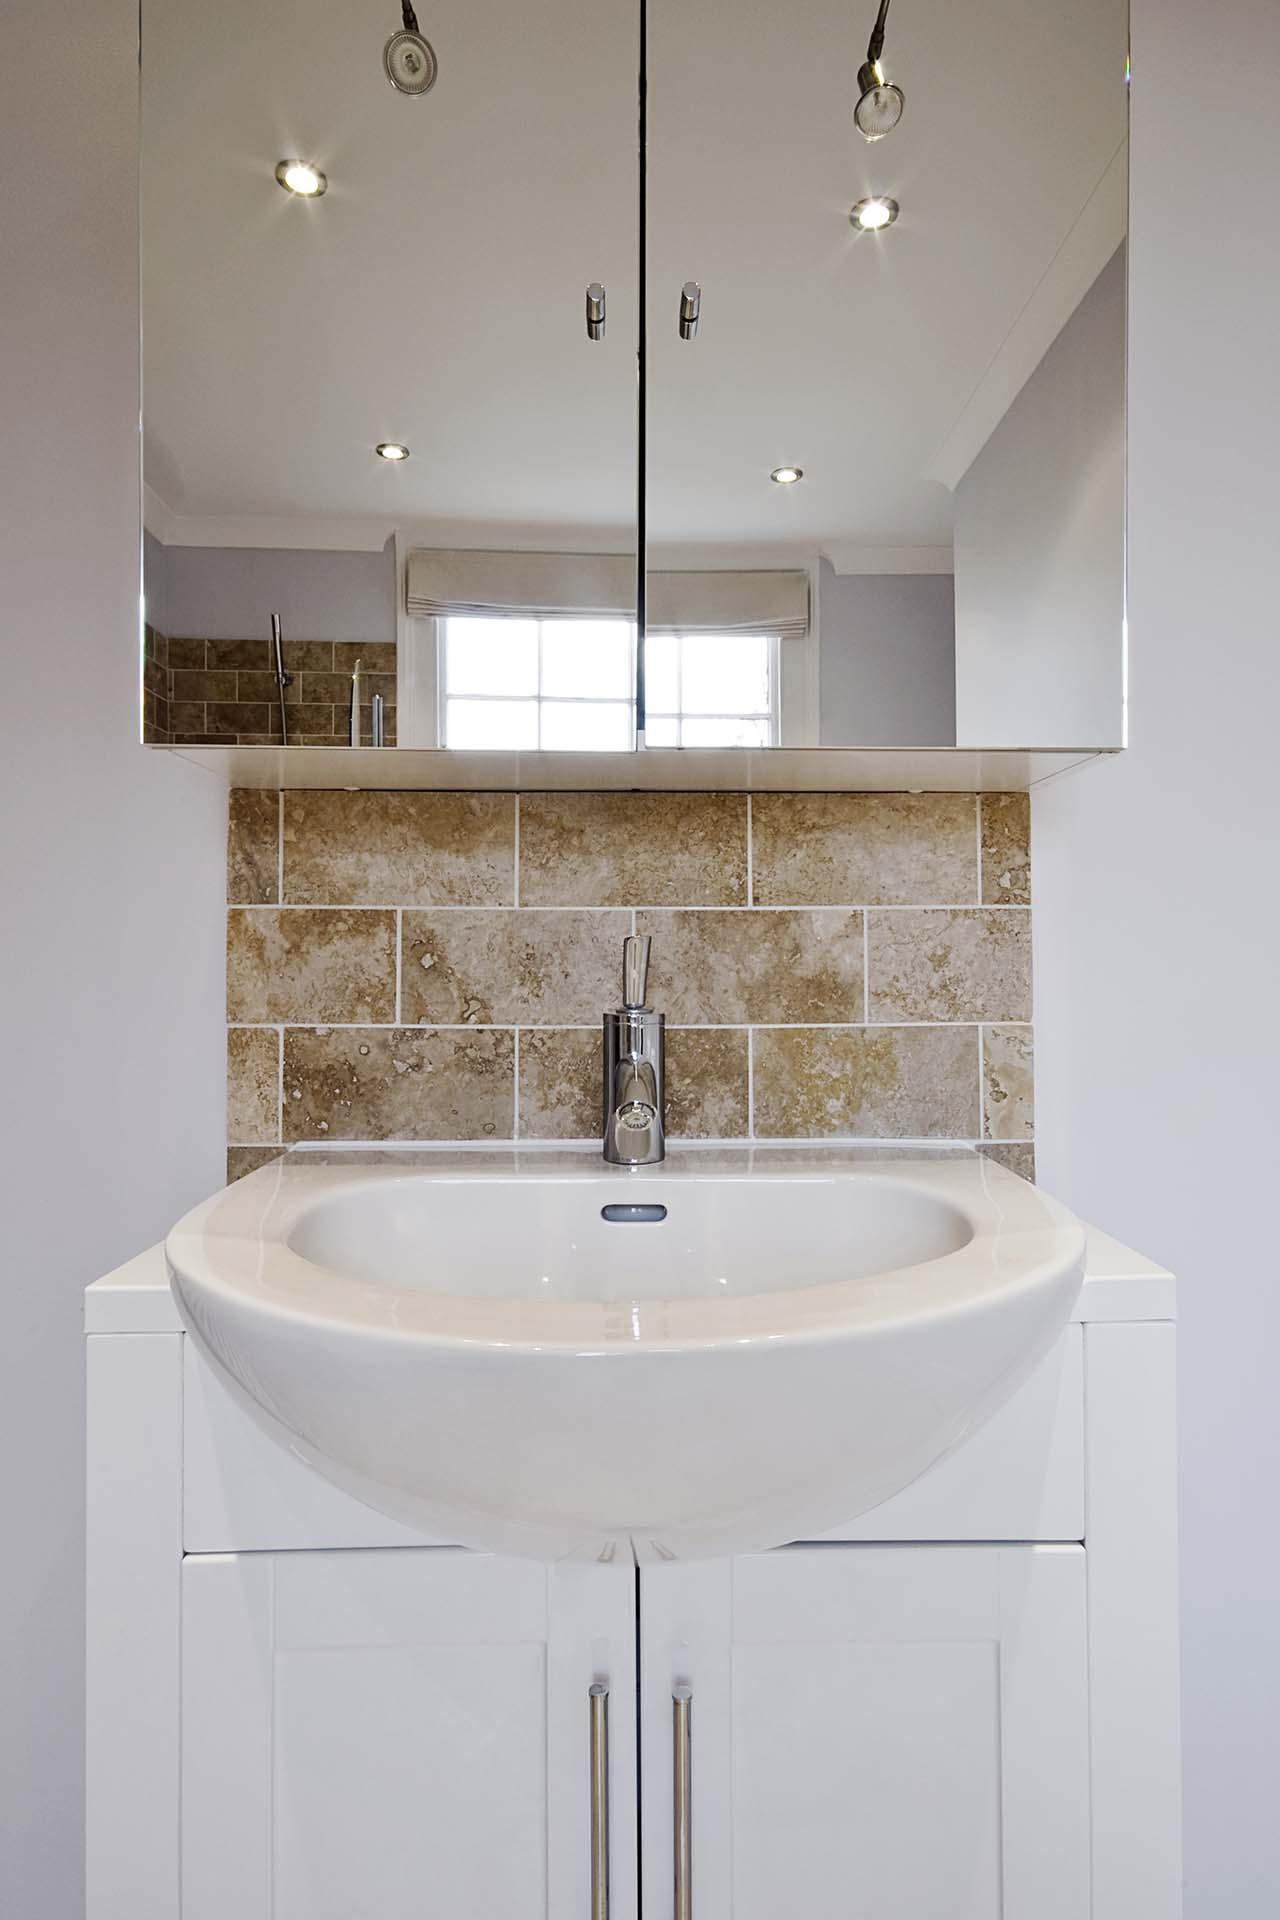 Custom World Bedrooms Bathroom Furniture - Custom made bathroom units to suit all styles